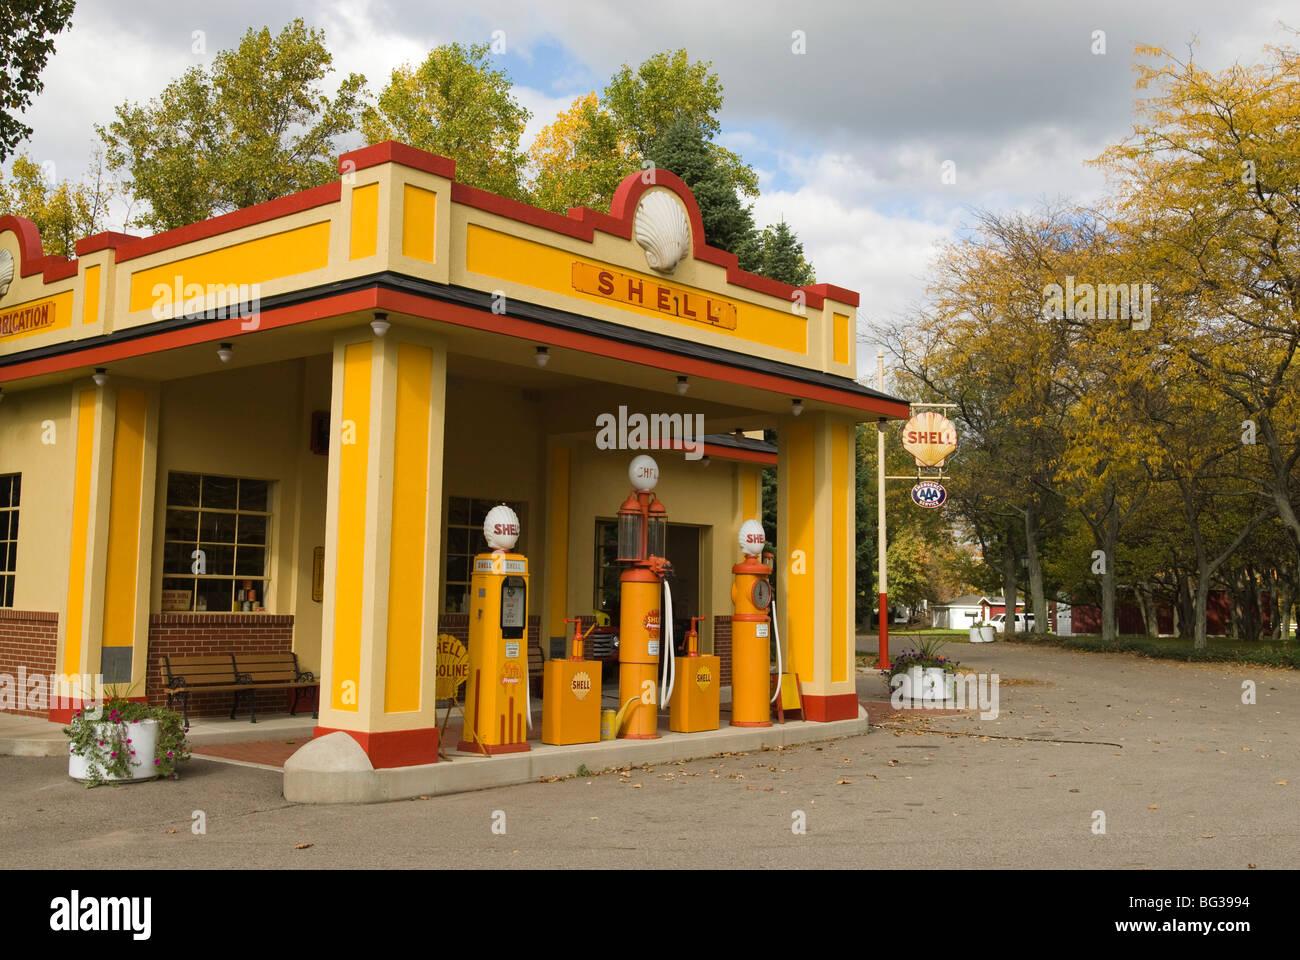 Gilmore Car Museum, Hickory Corners, Michigan, United States of America, North America - Stock Image